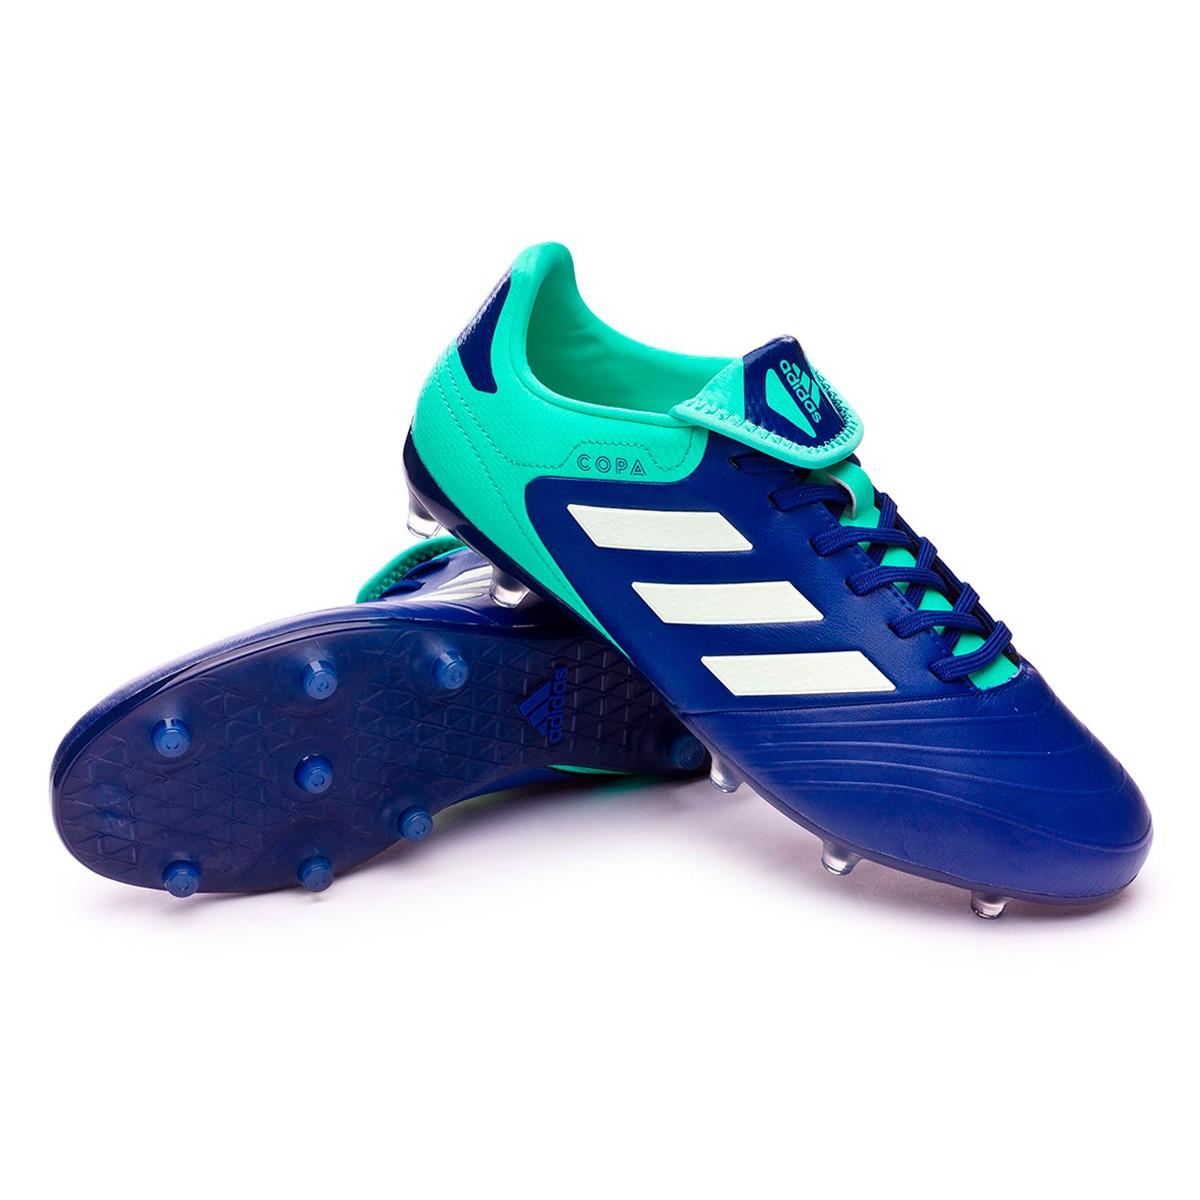 size 40 39b0f b92c7 adidas Copa 18.3 FG Boot. Unity ink-Aero ...